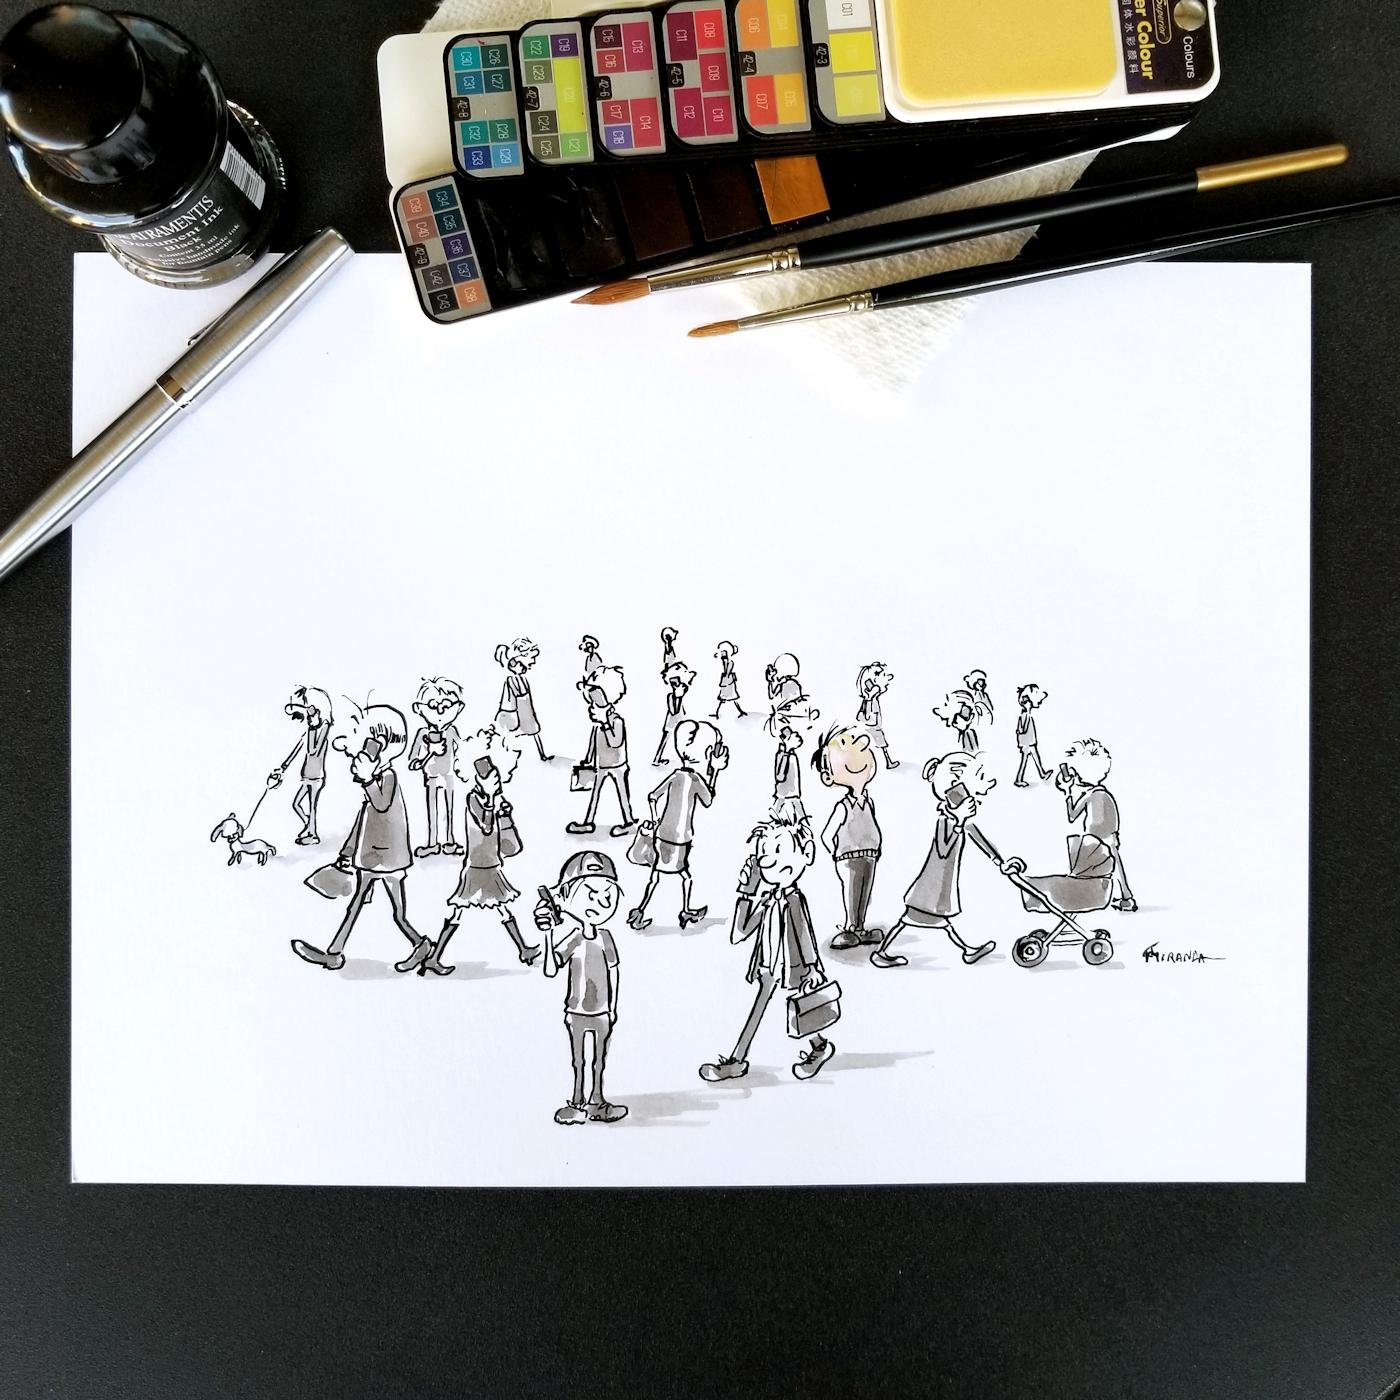 JMSC-170 Unplugged photo of original illustration by Joana Miranda